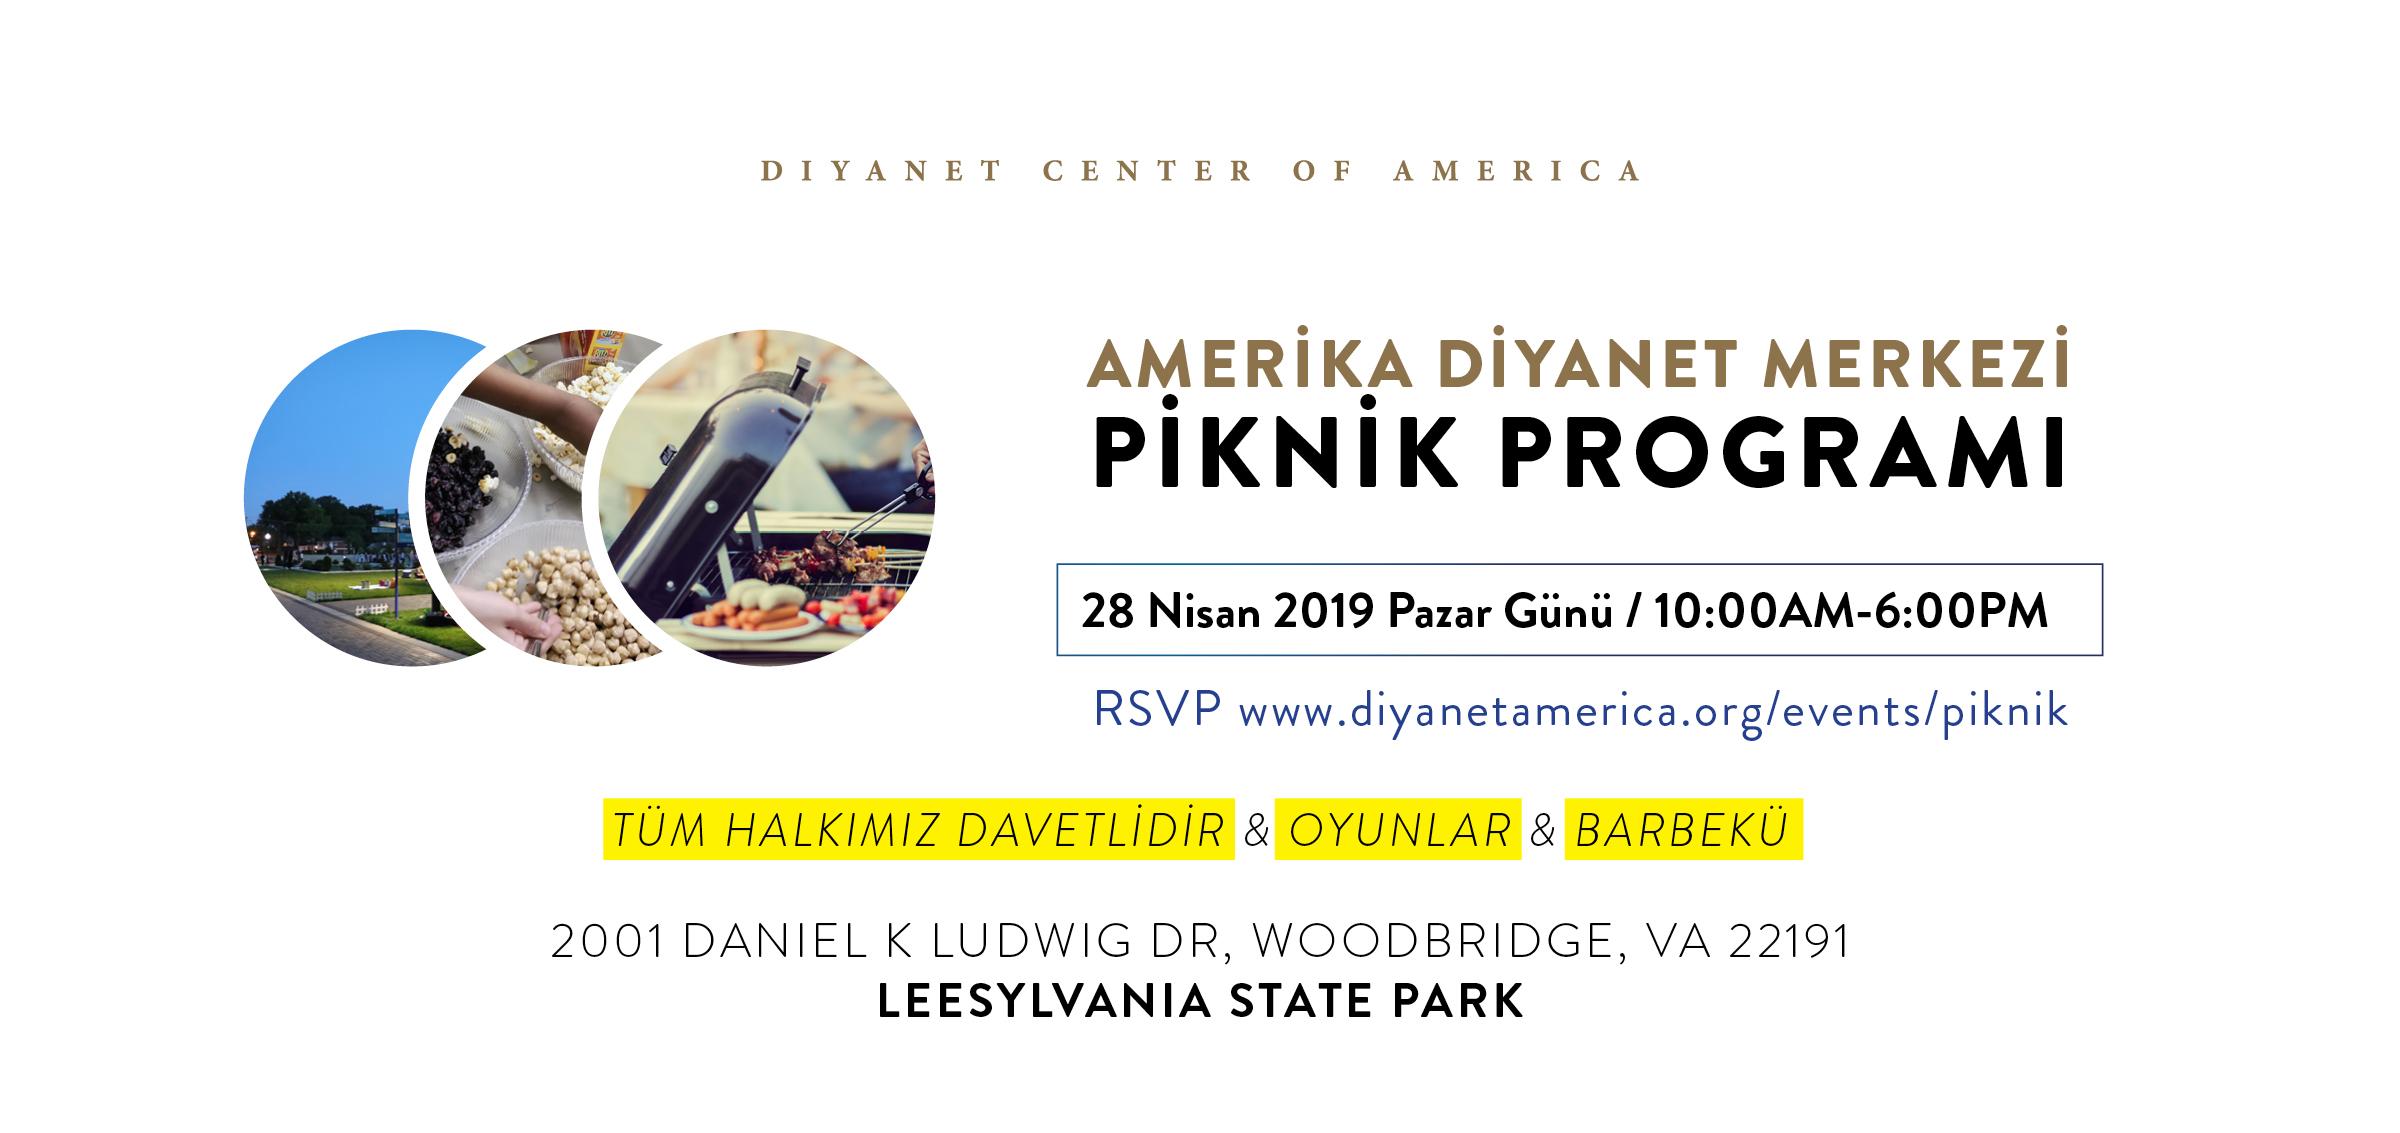 Amerika Diyanet Merkezi Piknik Programı